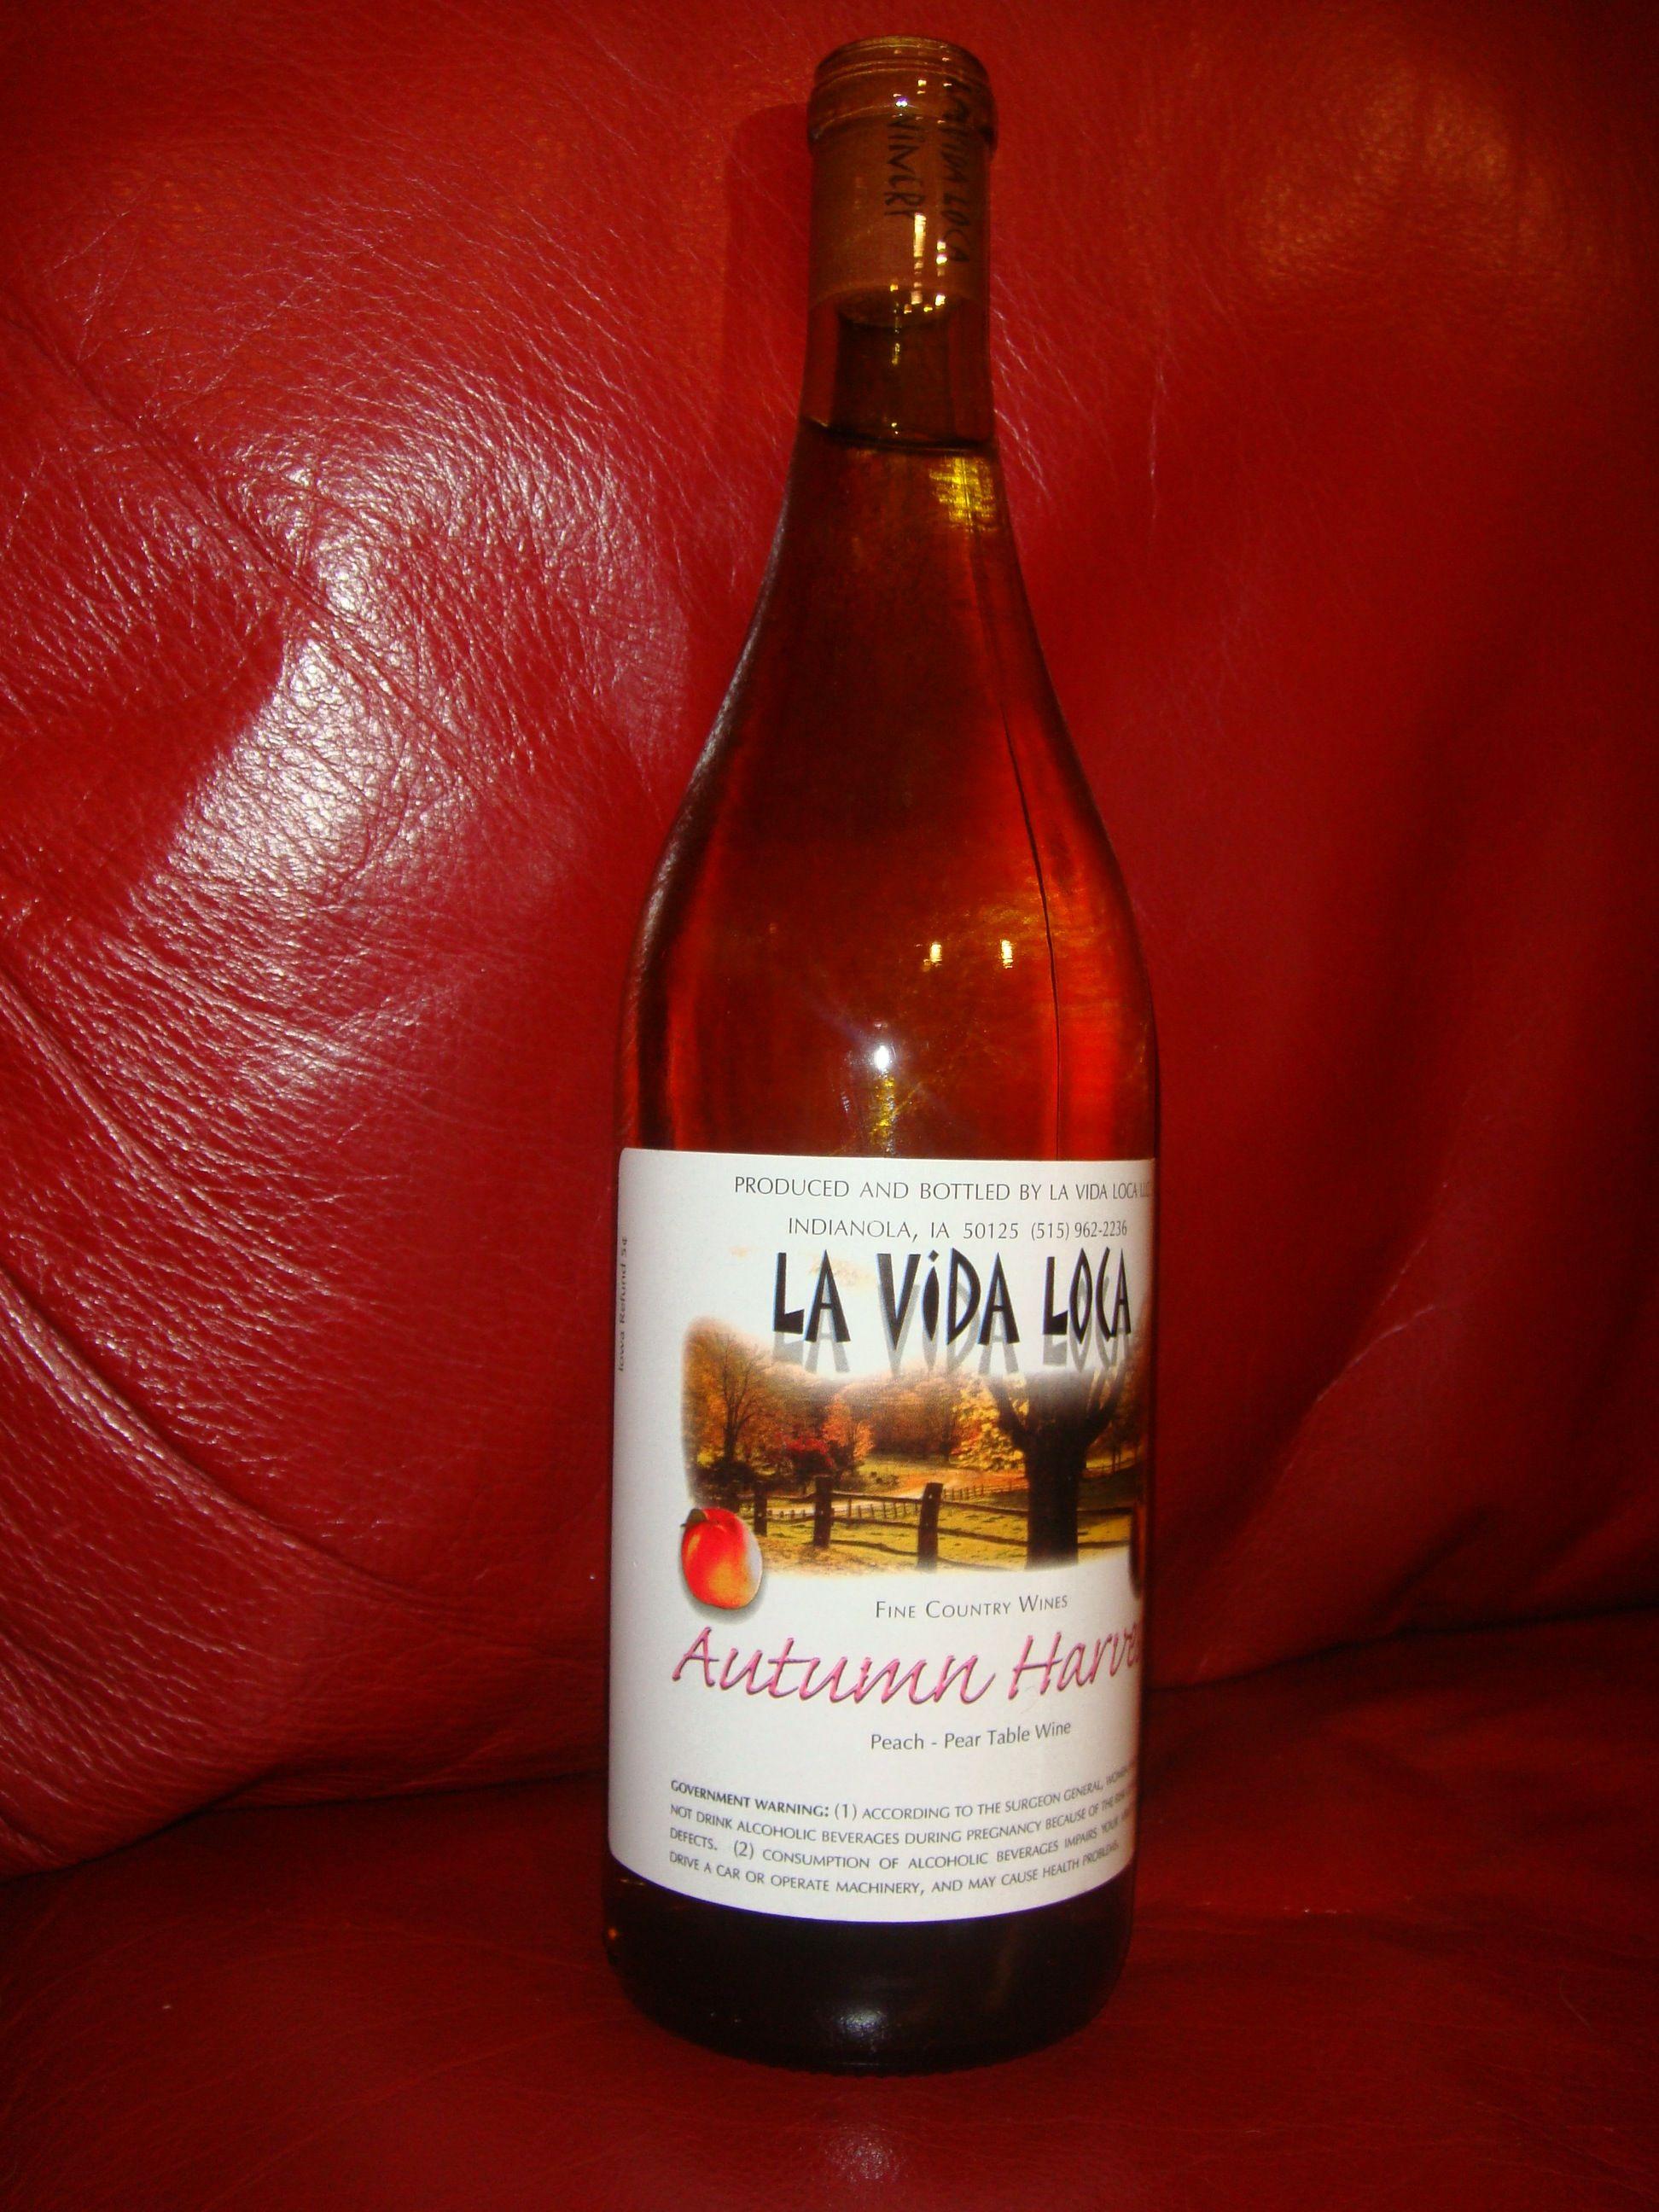 Autumn Harvest Peach Pear Table Wine By La Vida Loca Winery In Indianola Ia Wine Bottle Winery Distillery